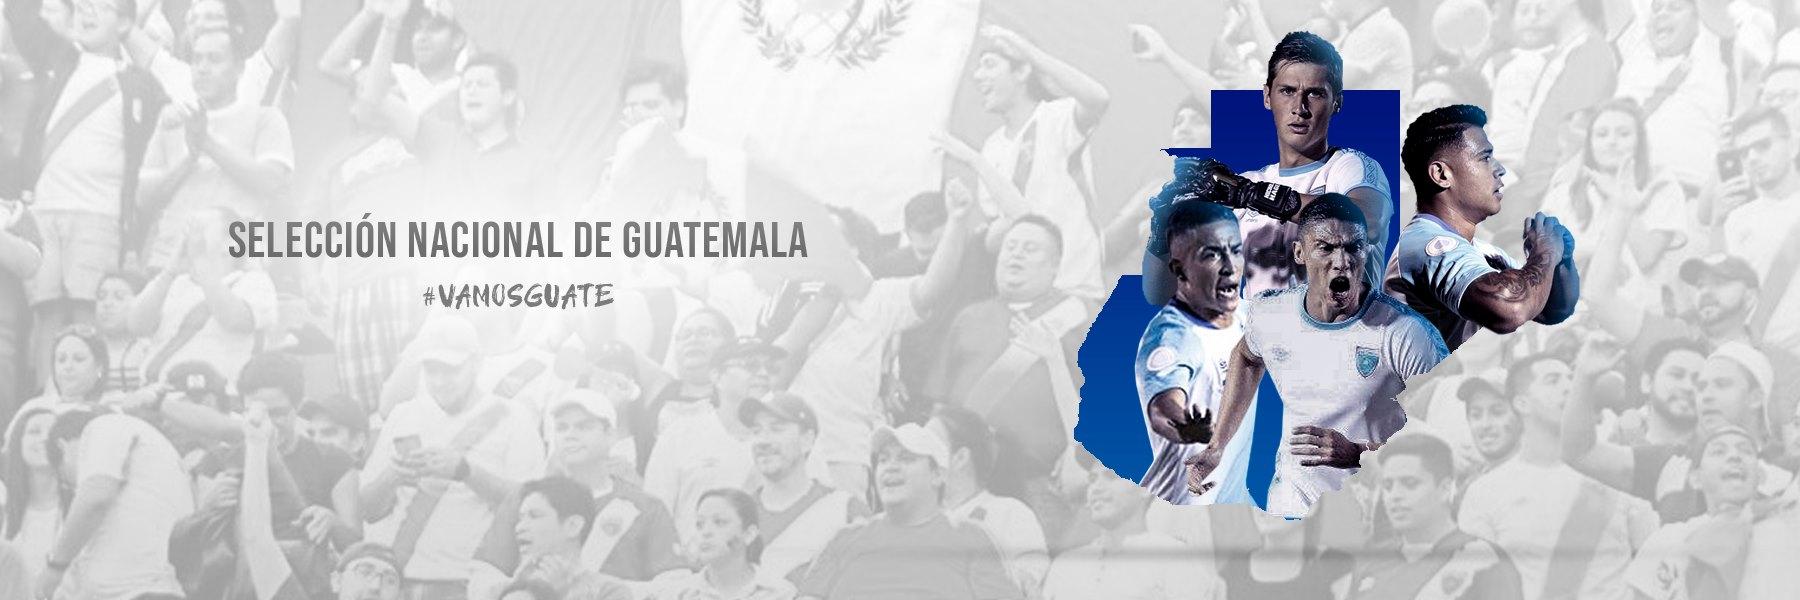 (Foto: Selección Nacional de Guatemala)